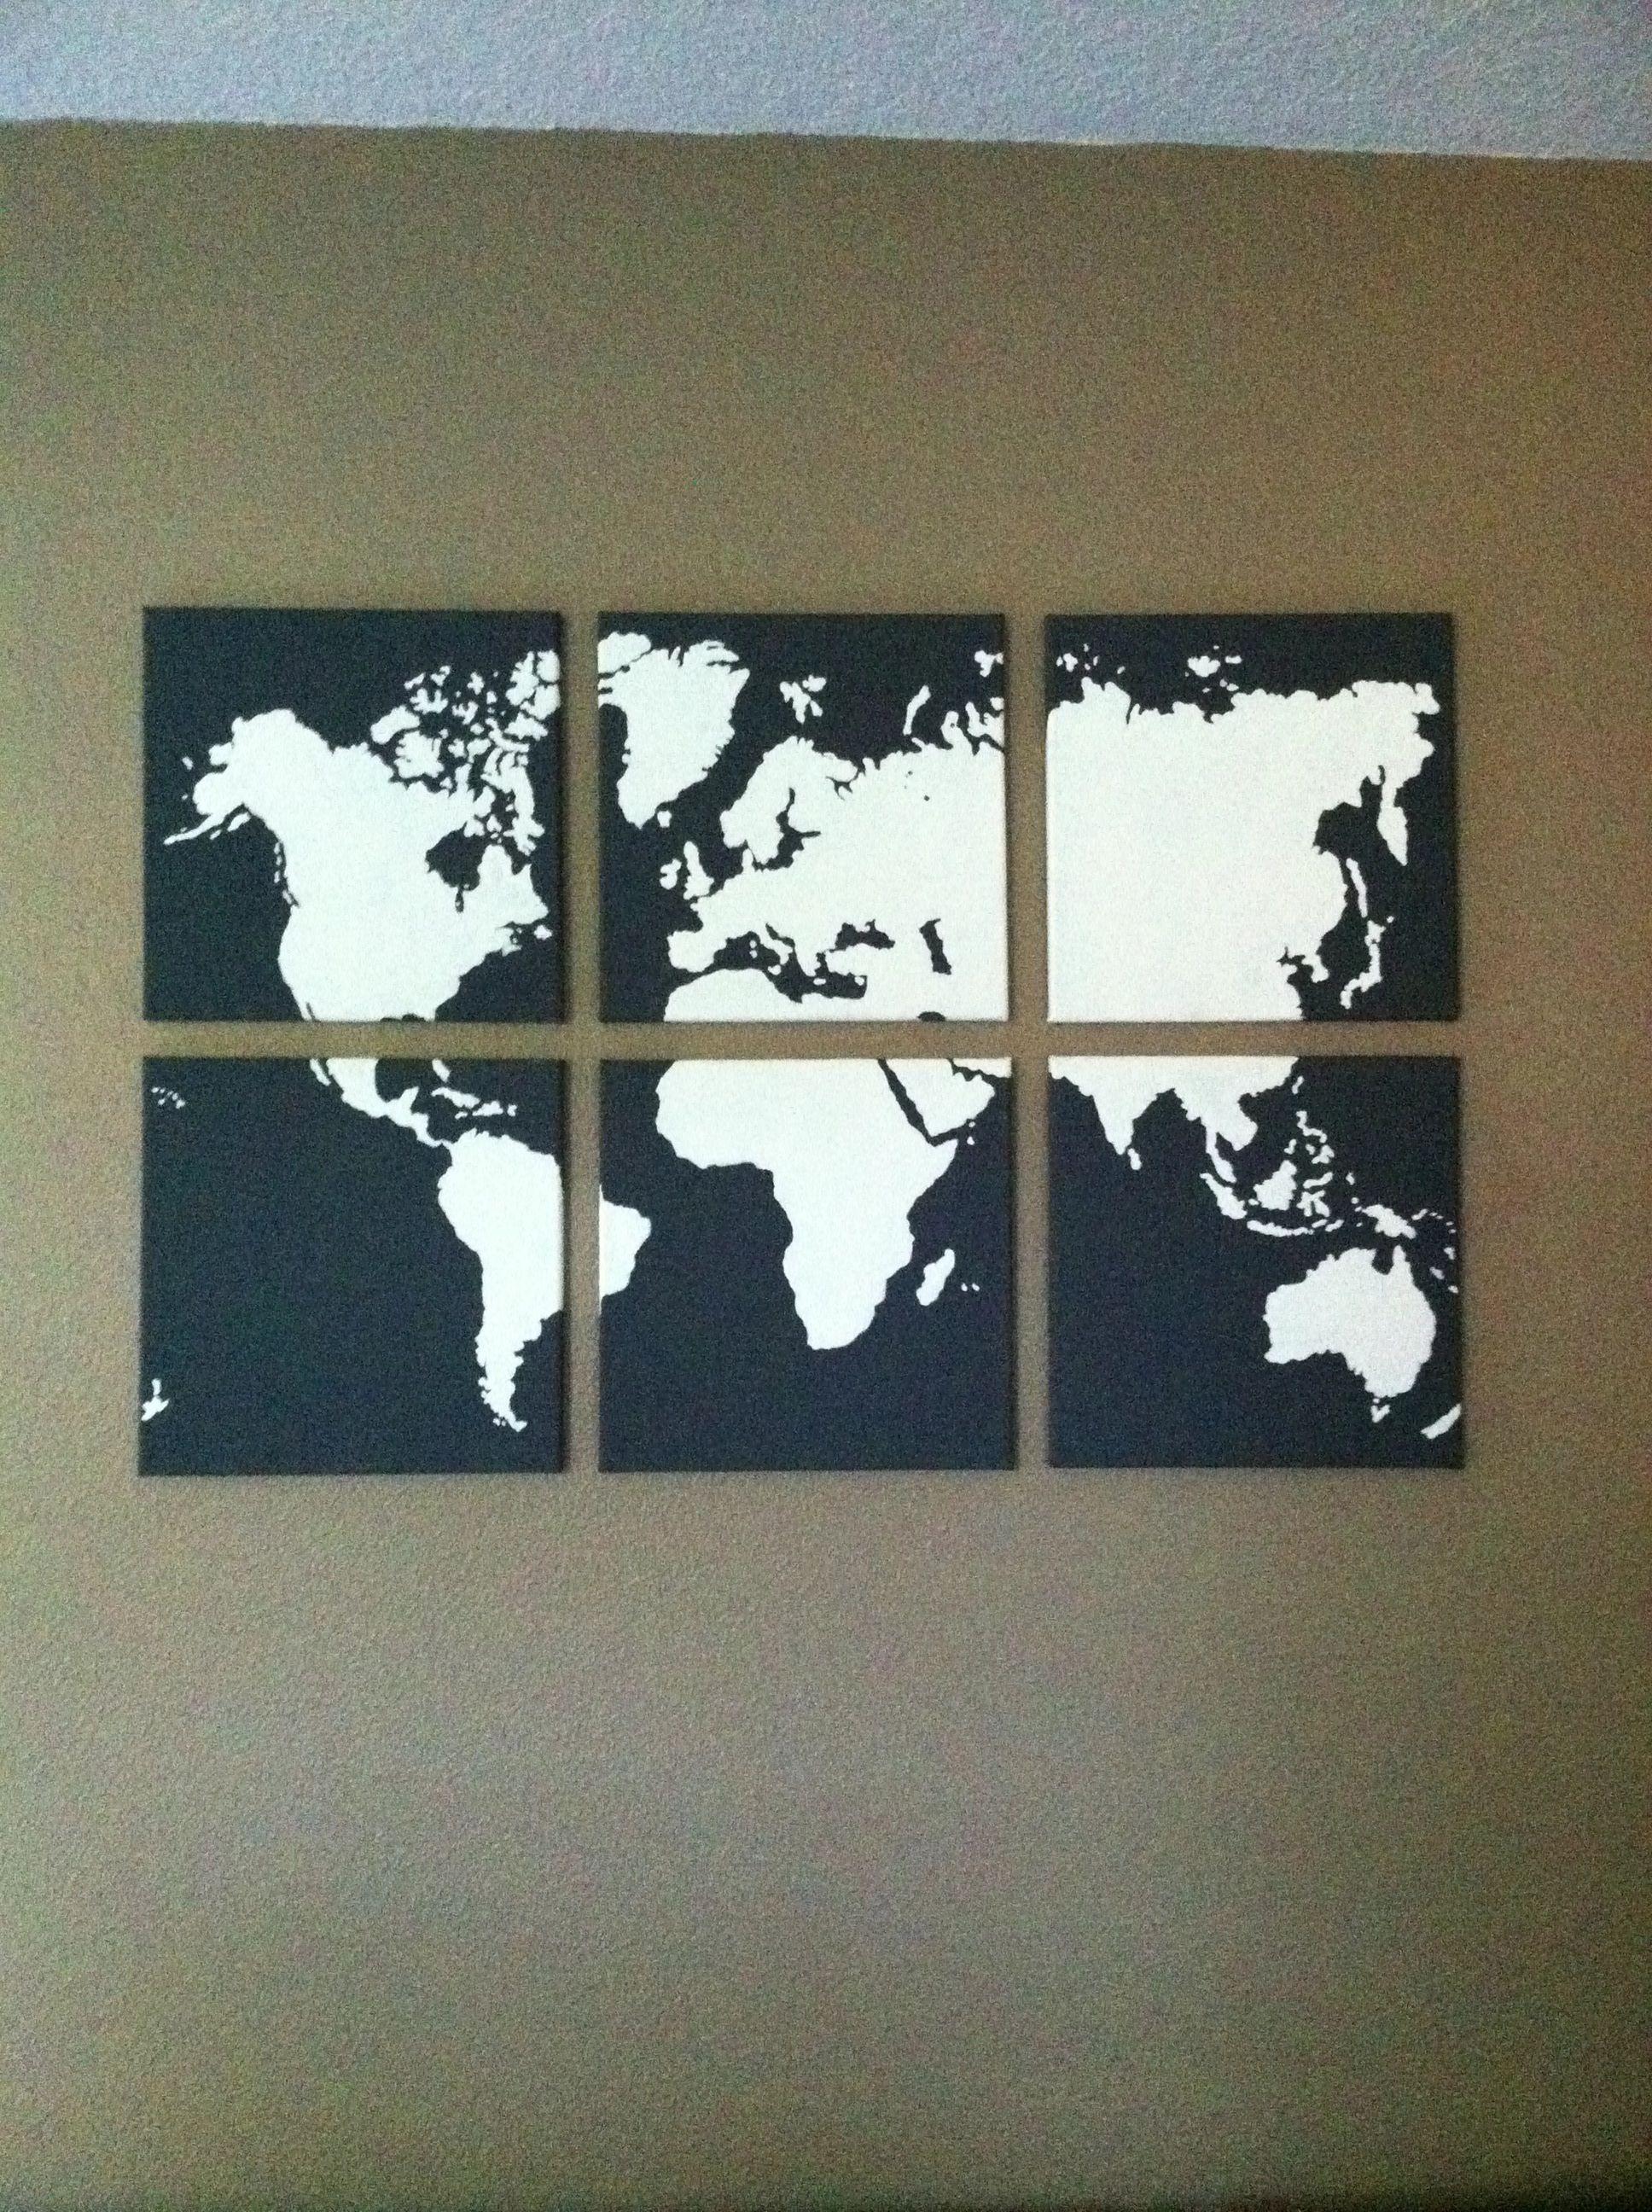 World map multi canvas painting pinteres world map multi canvas painting more gumiabroncs Images